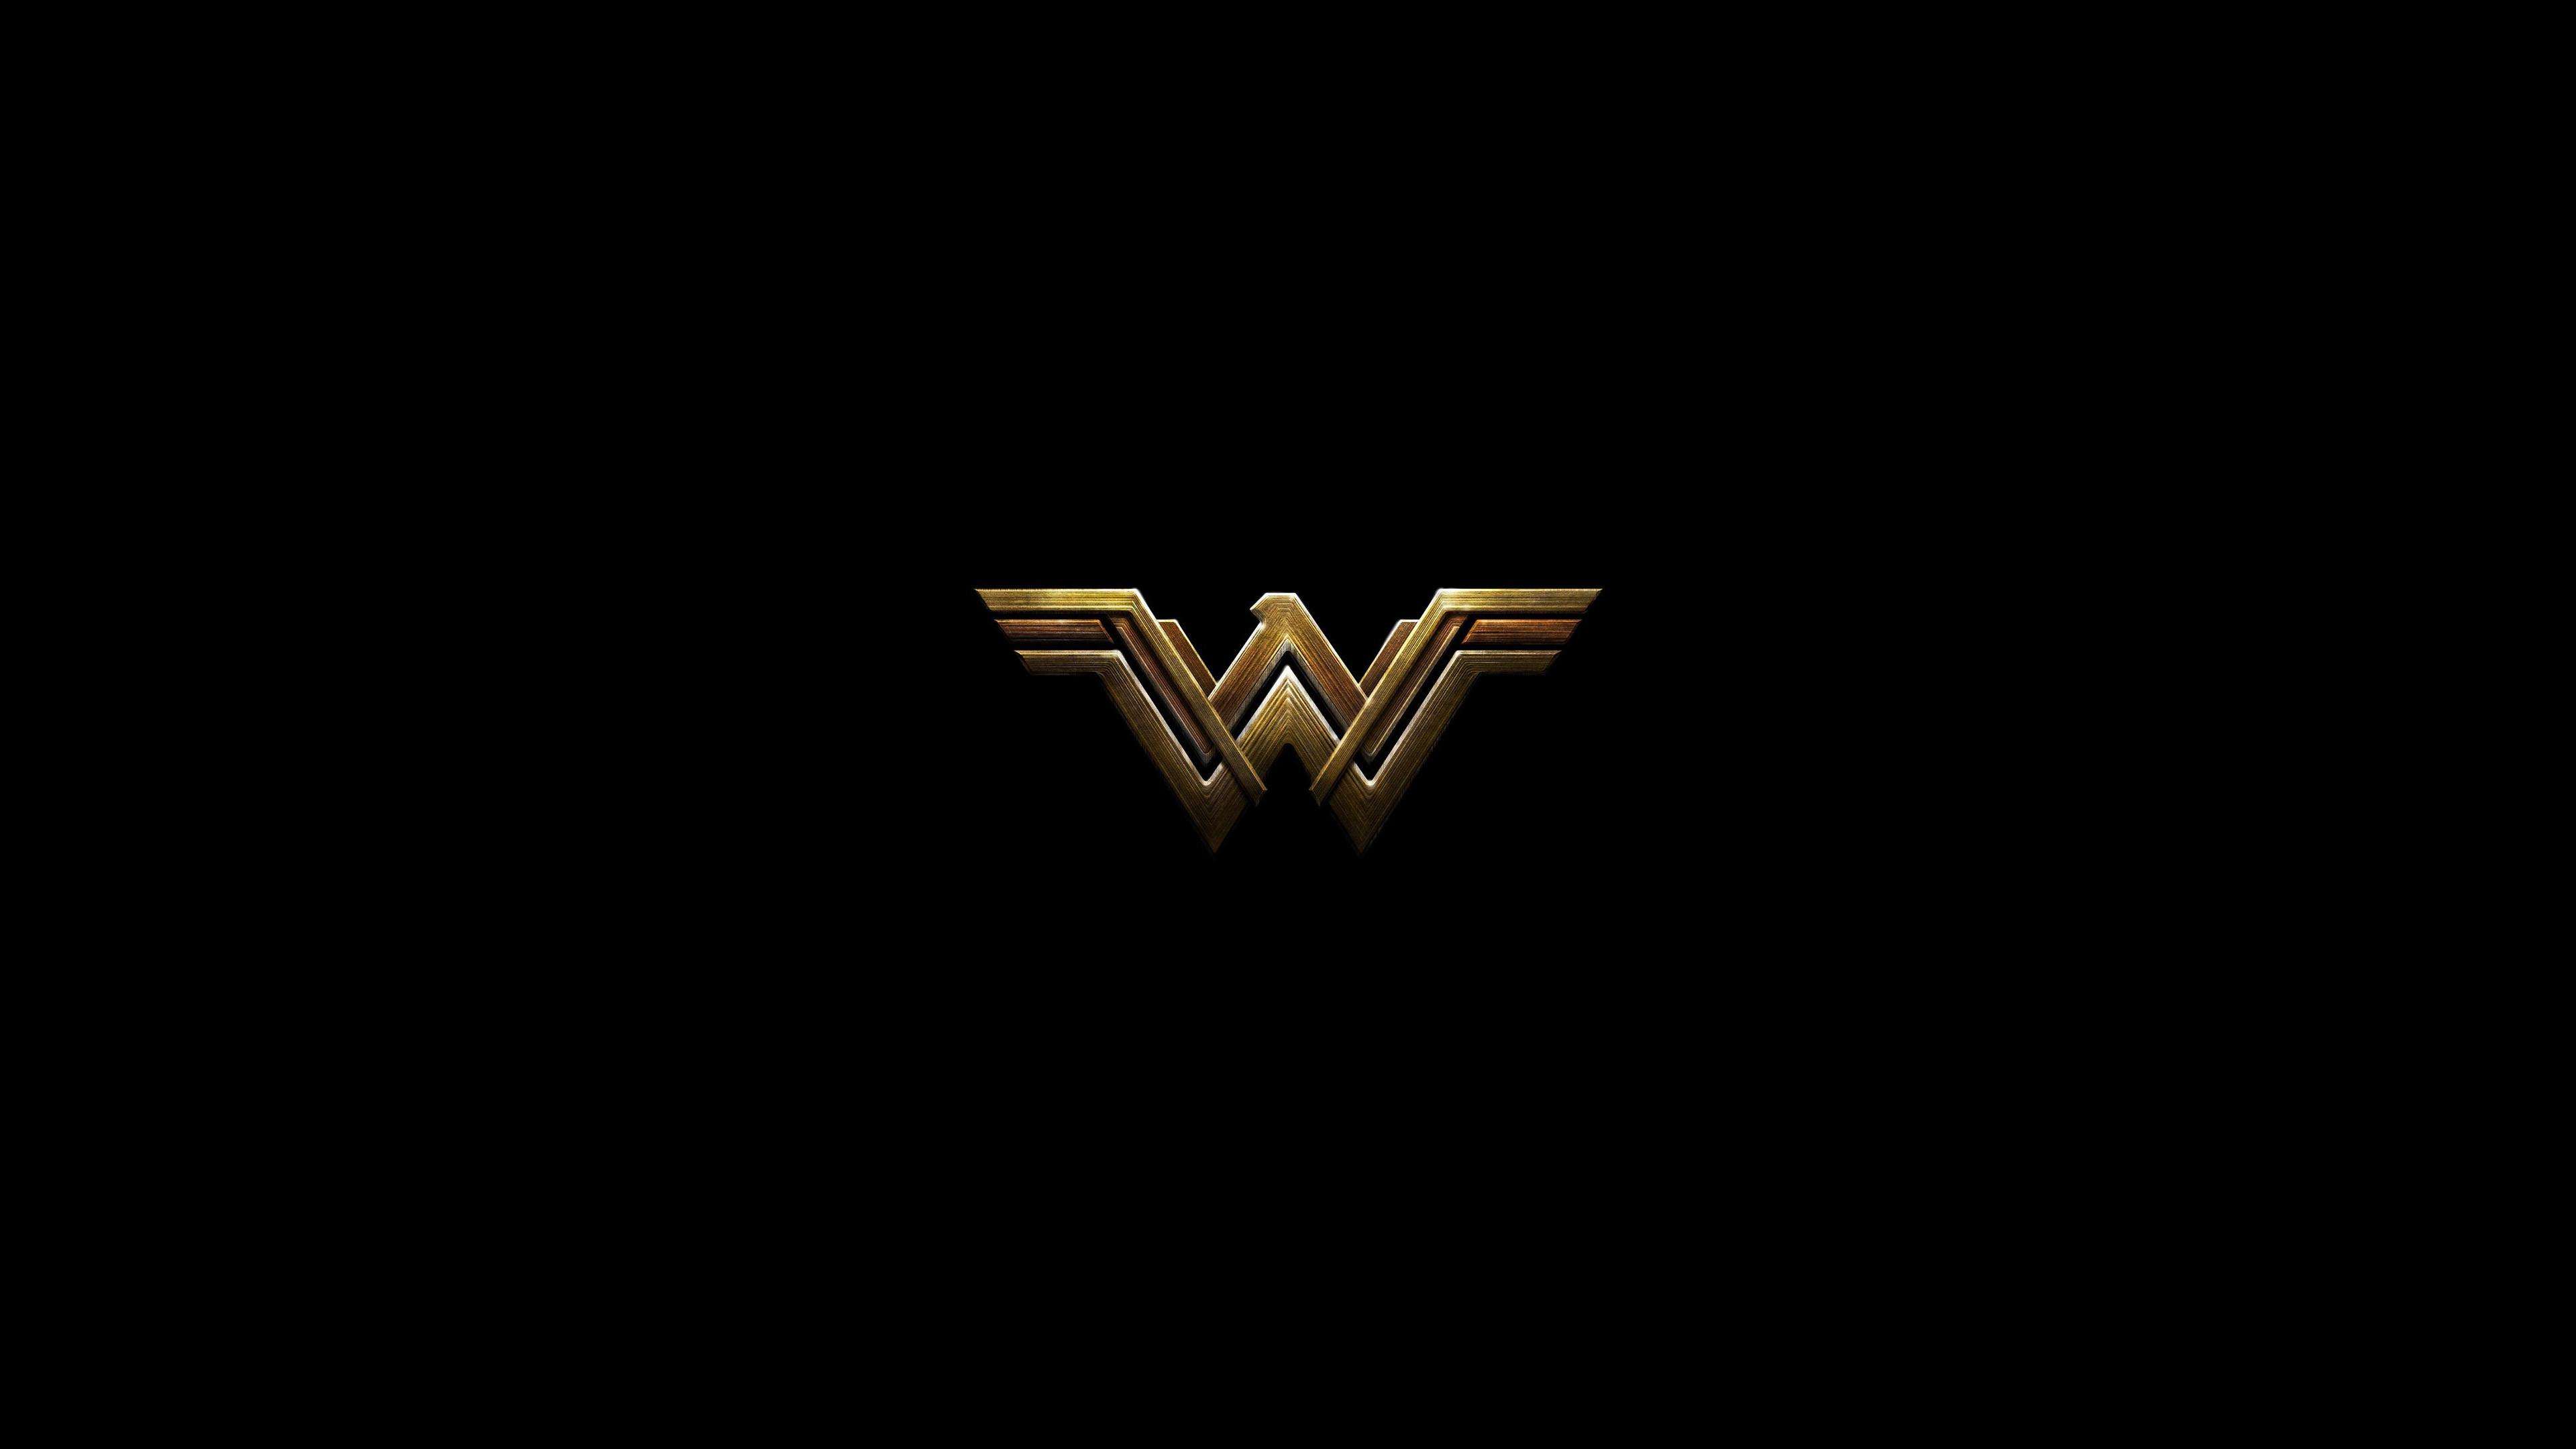 Wonder Woman Dark Logo 4k